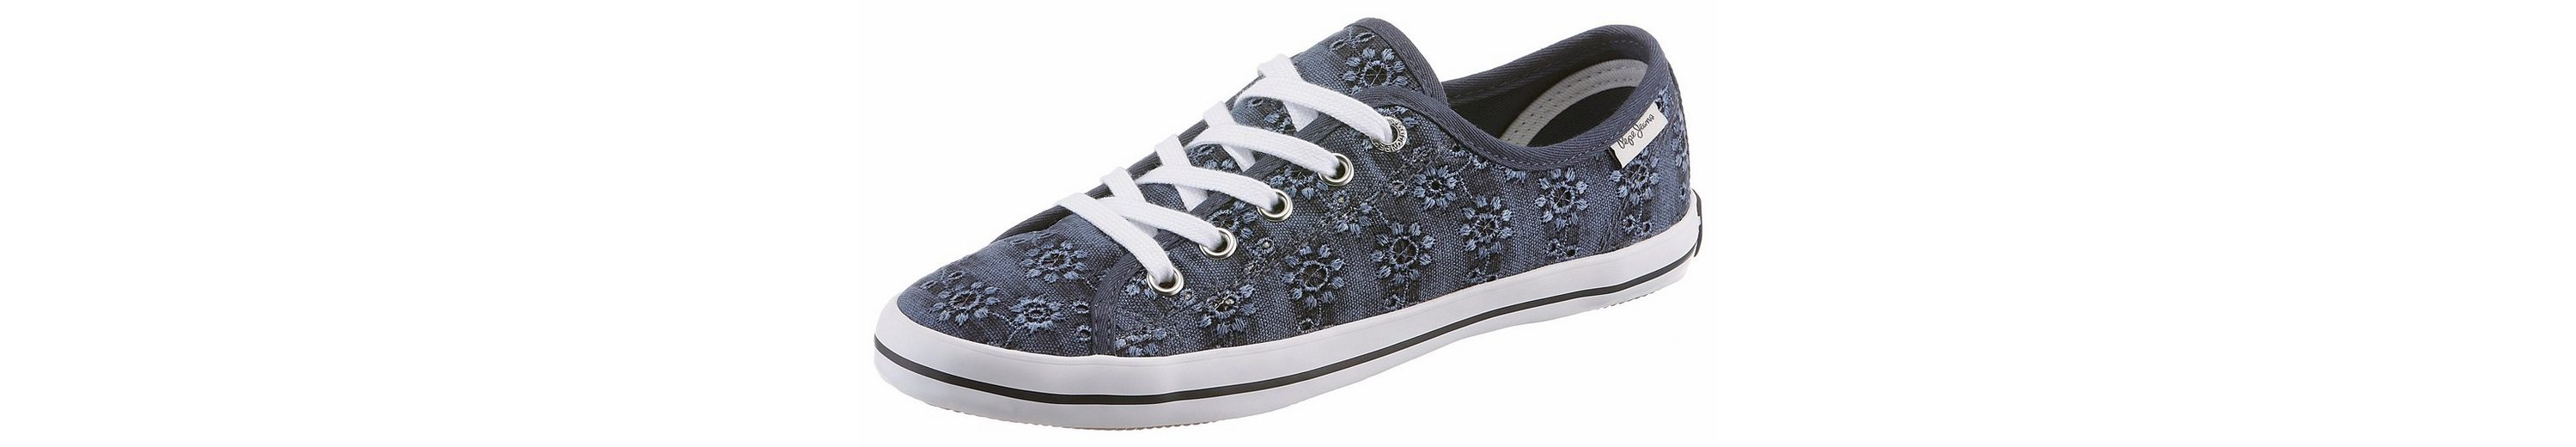 Pepe Jeans GERY ANGLAISE Sneaker, mit Blütenstickerei